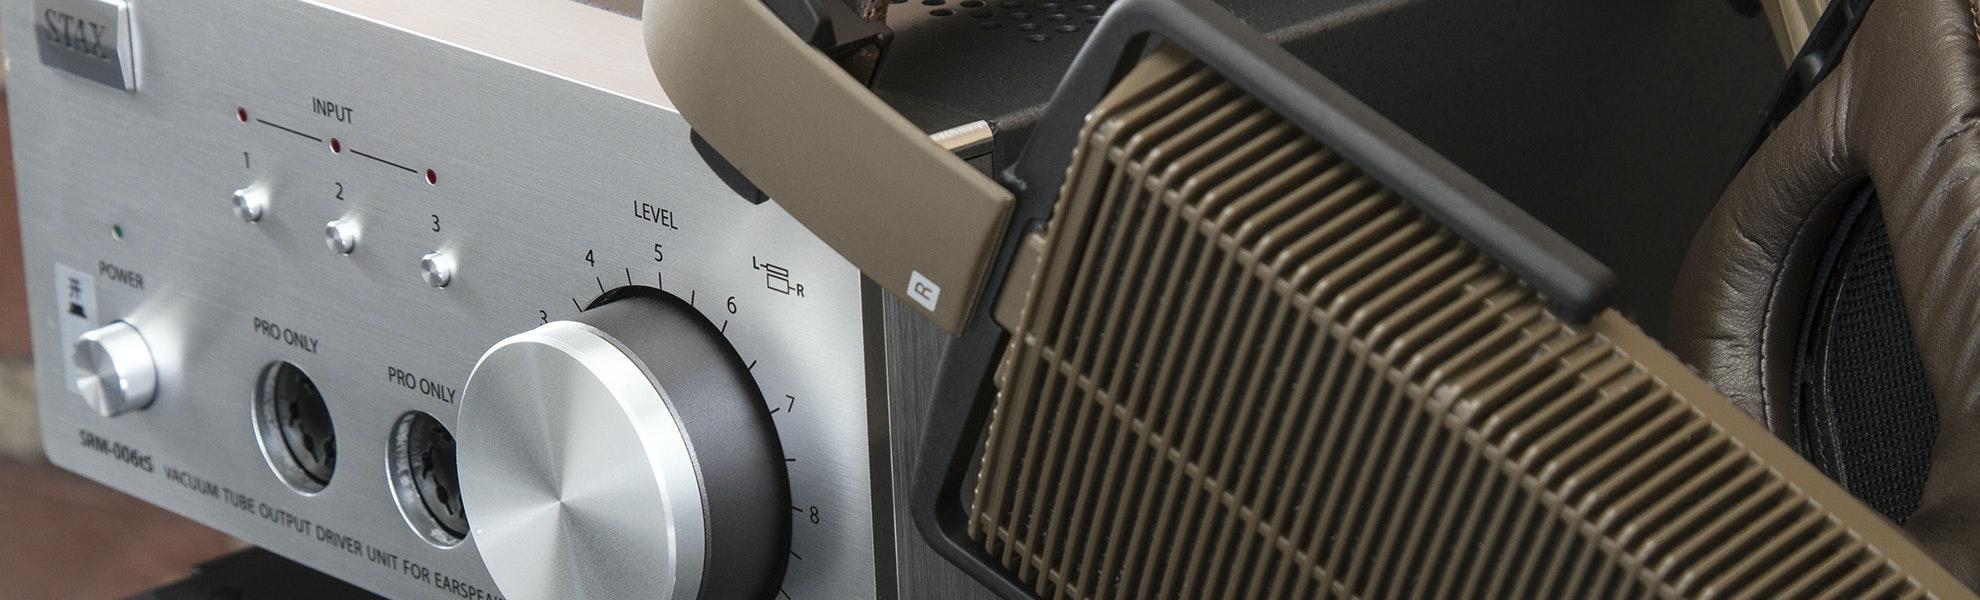 Stax SRS-4170 Electrostatic Earspeaker System